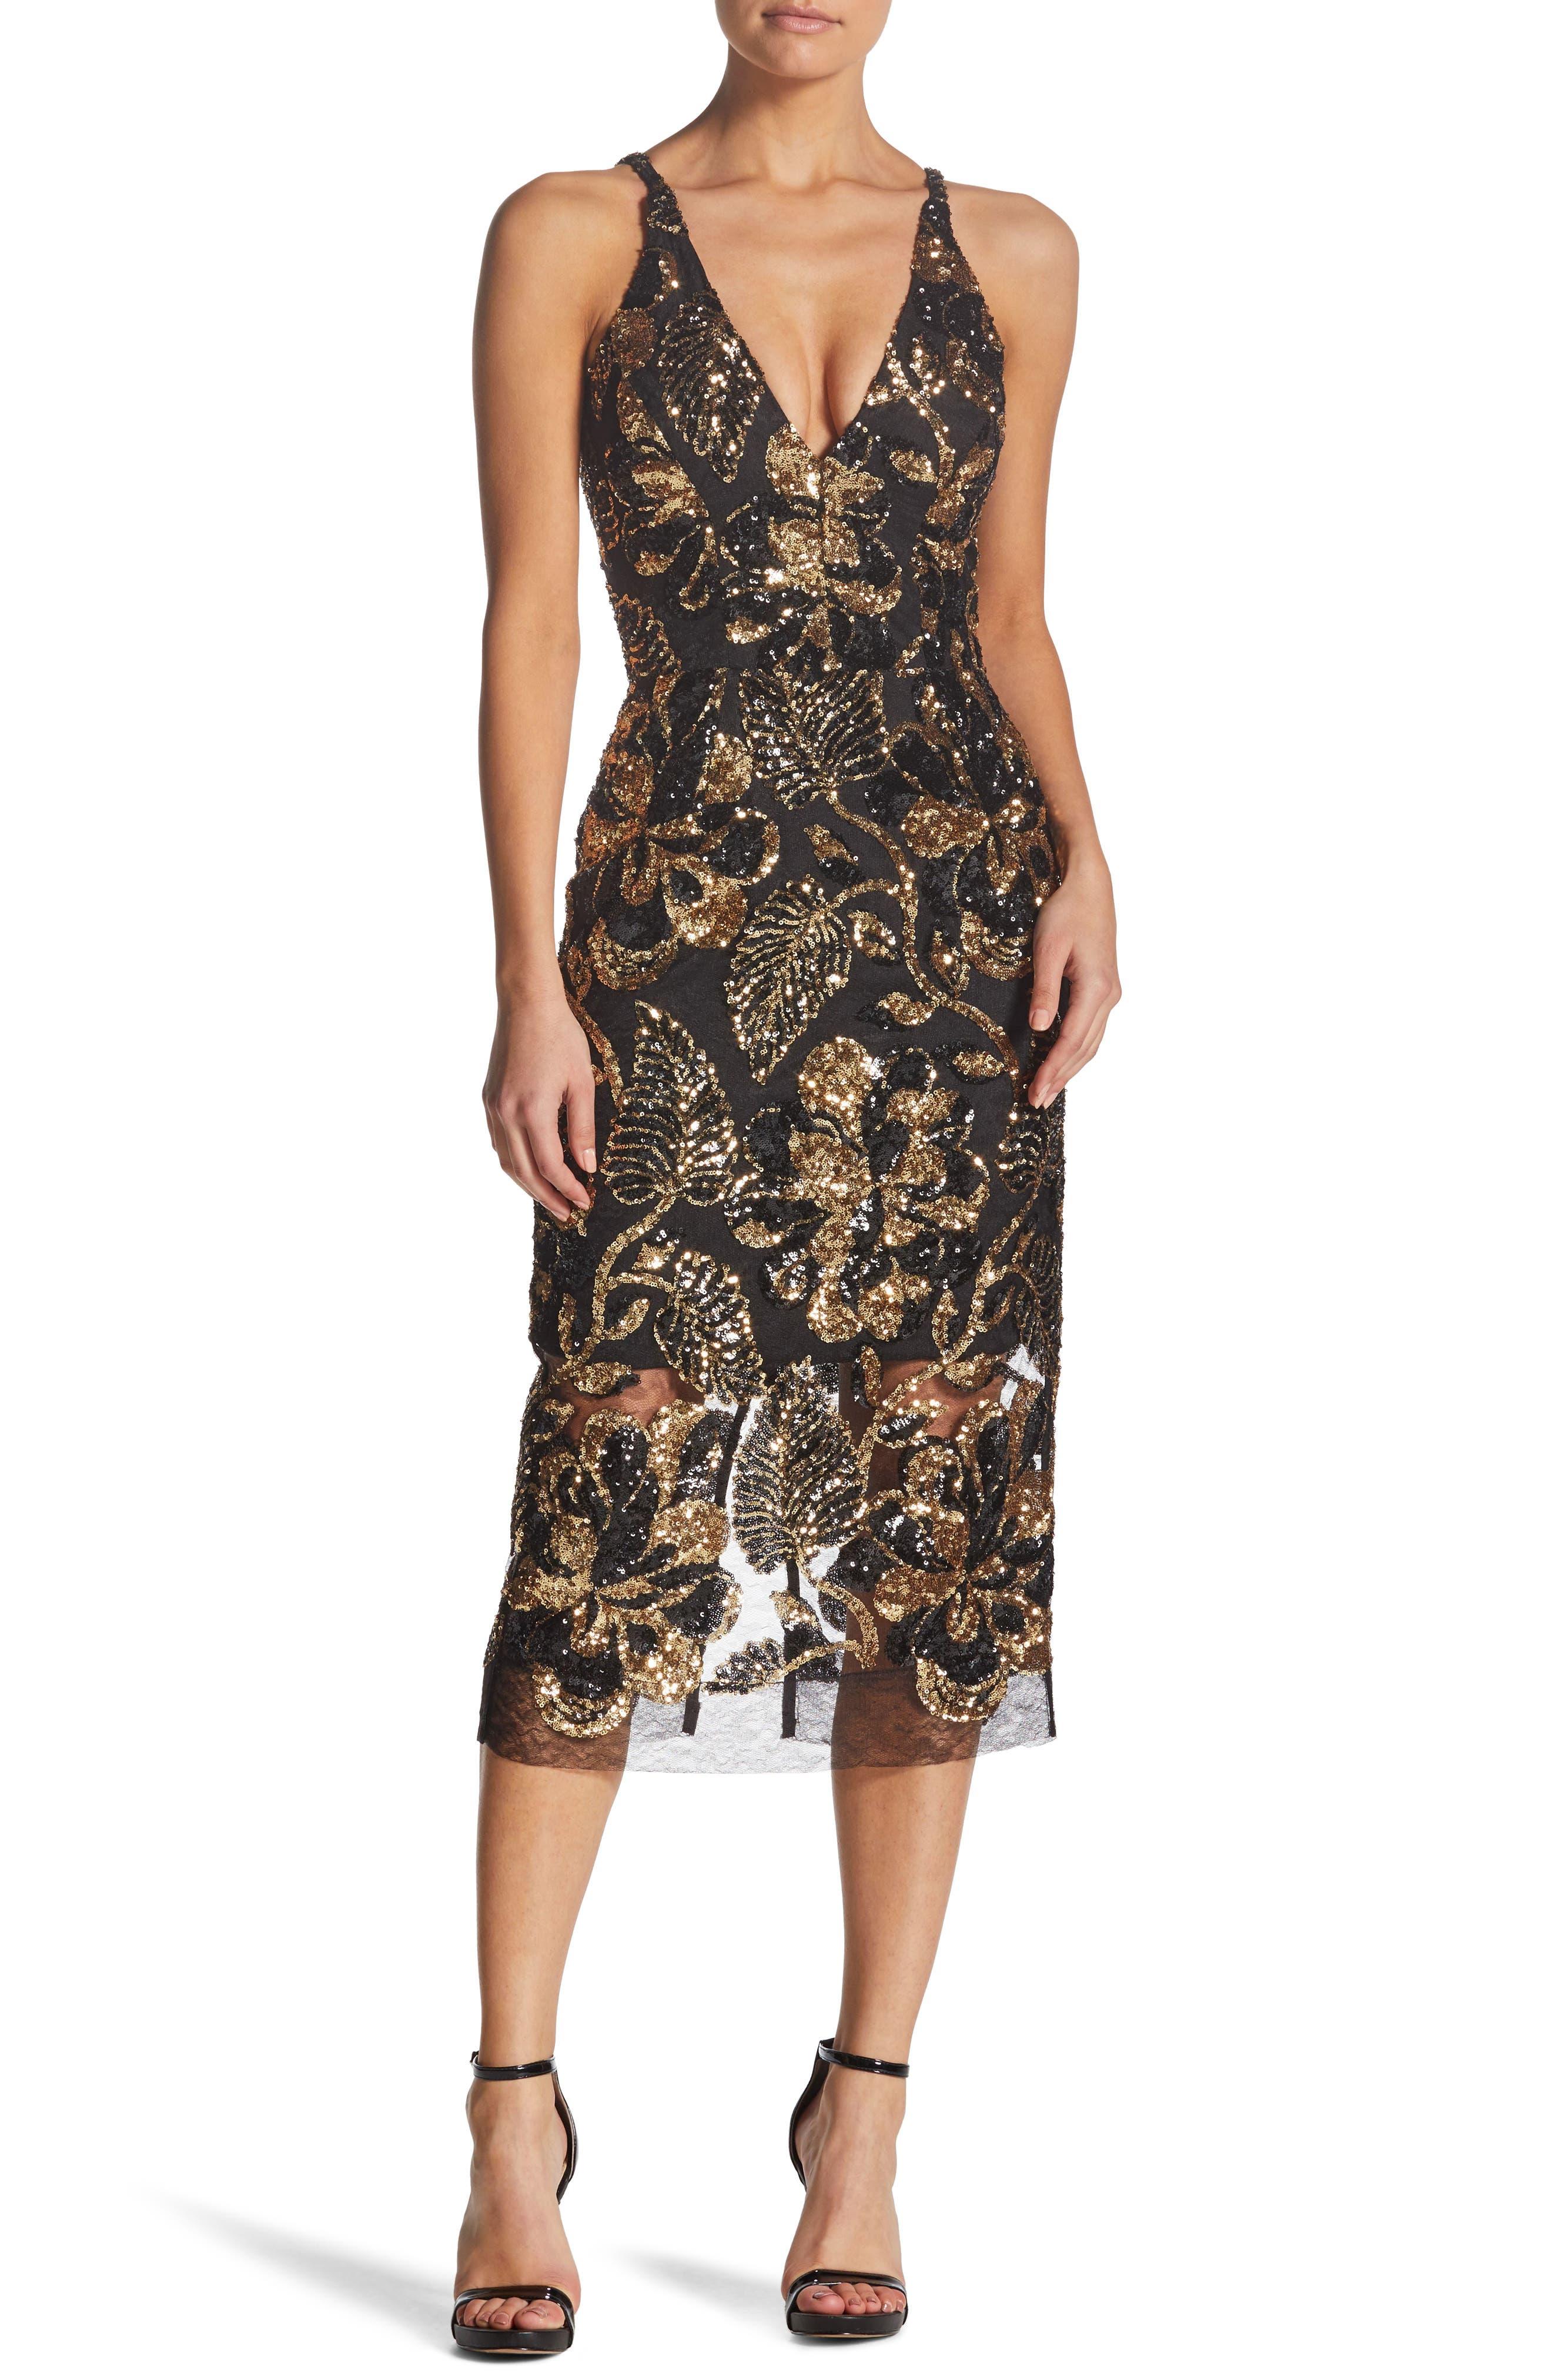 DRESS THE POPULATION Margo Plunge Neck Sequin Dress, Main, color, 715